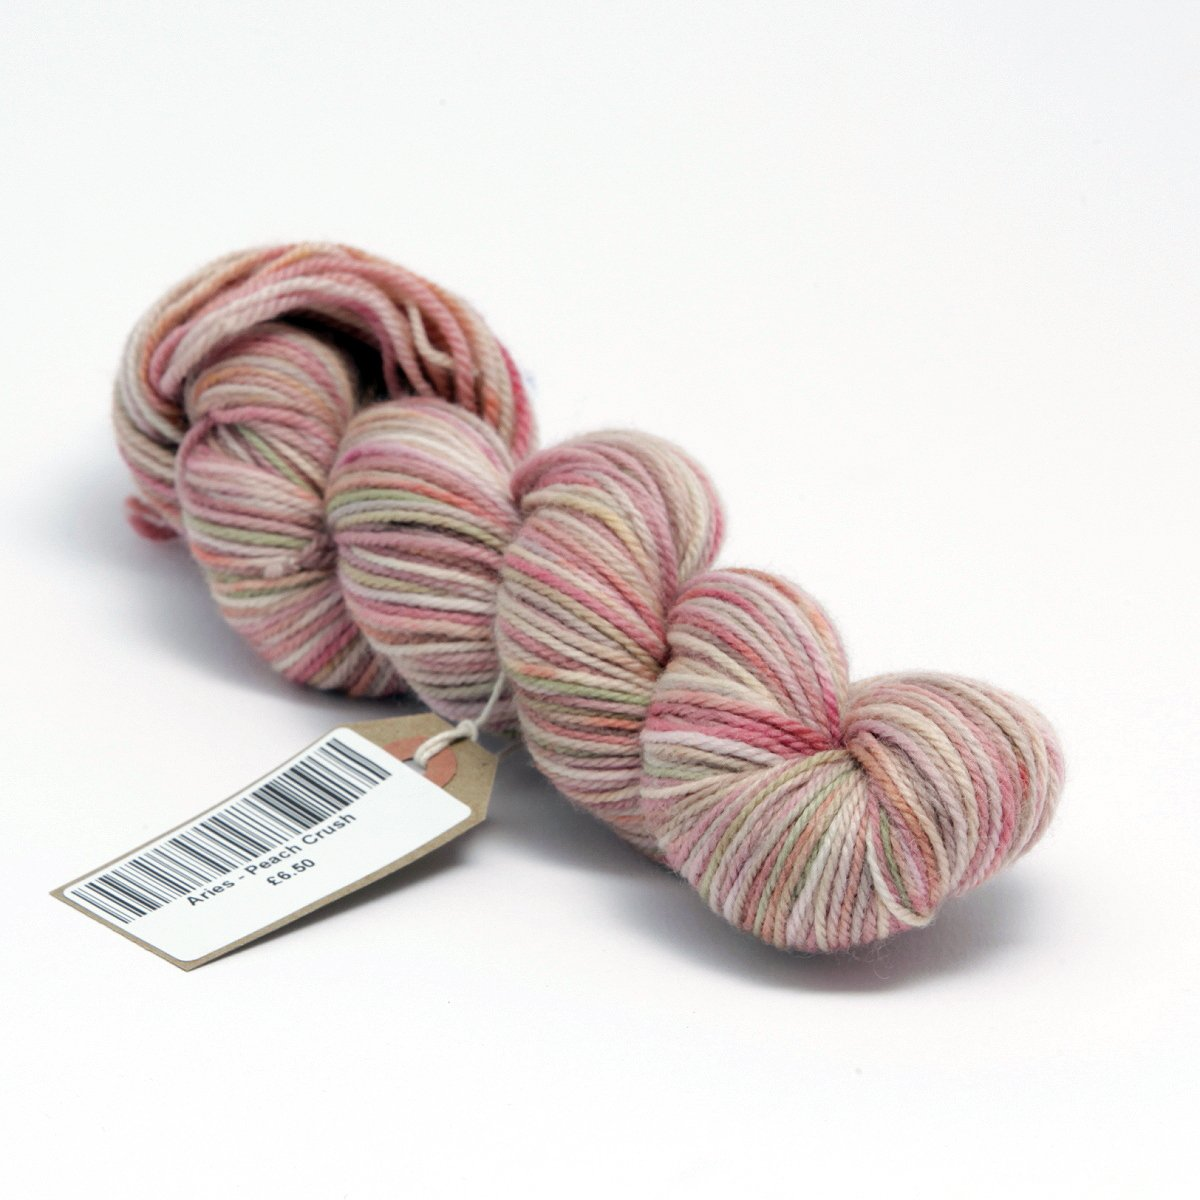 Hand Dyed Merino DK Knitting Yarn